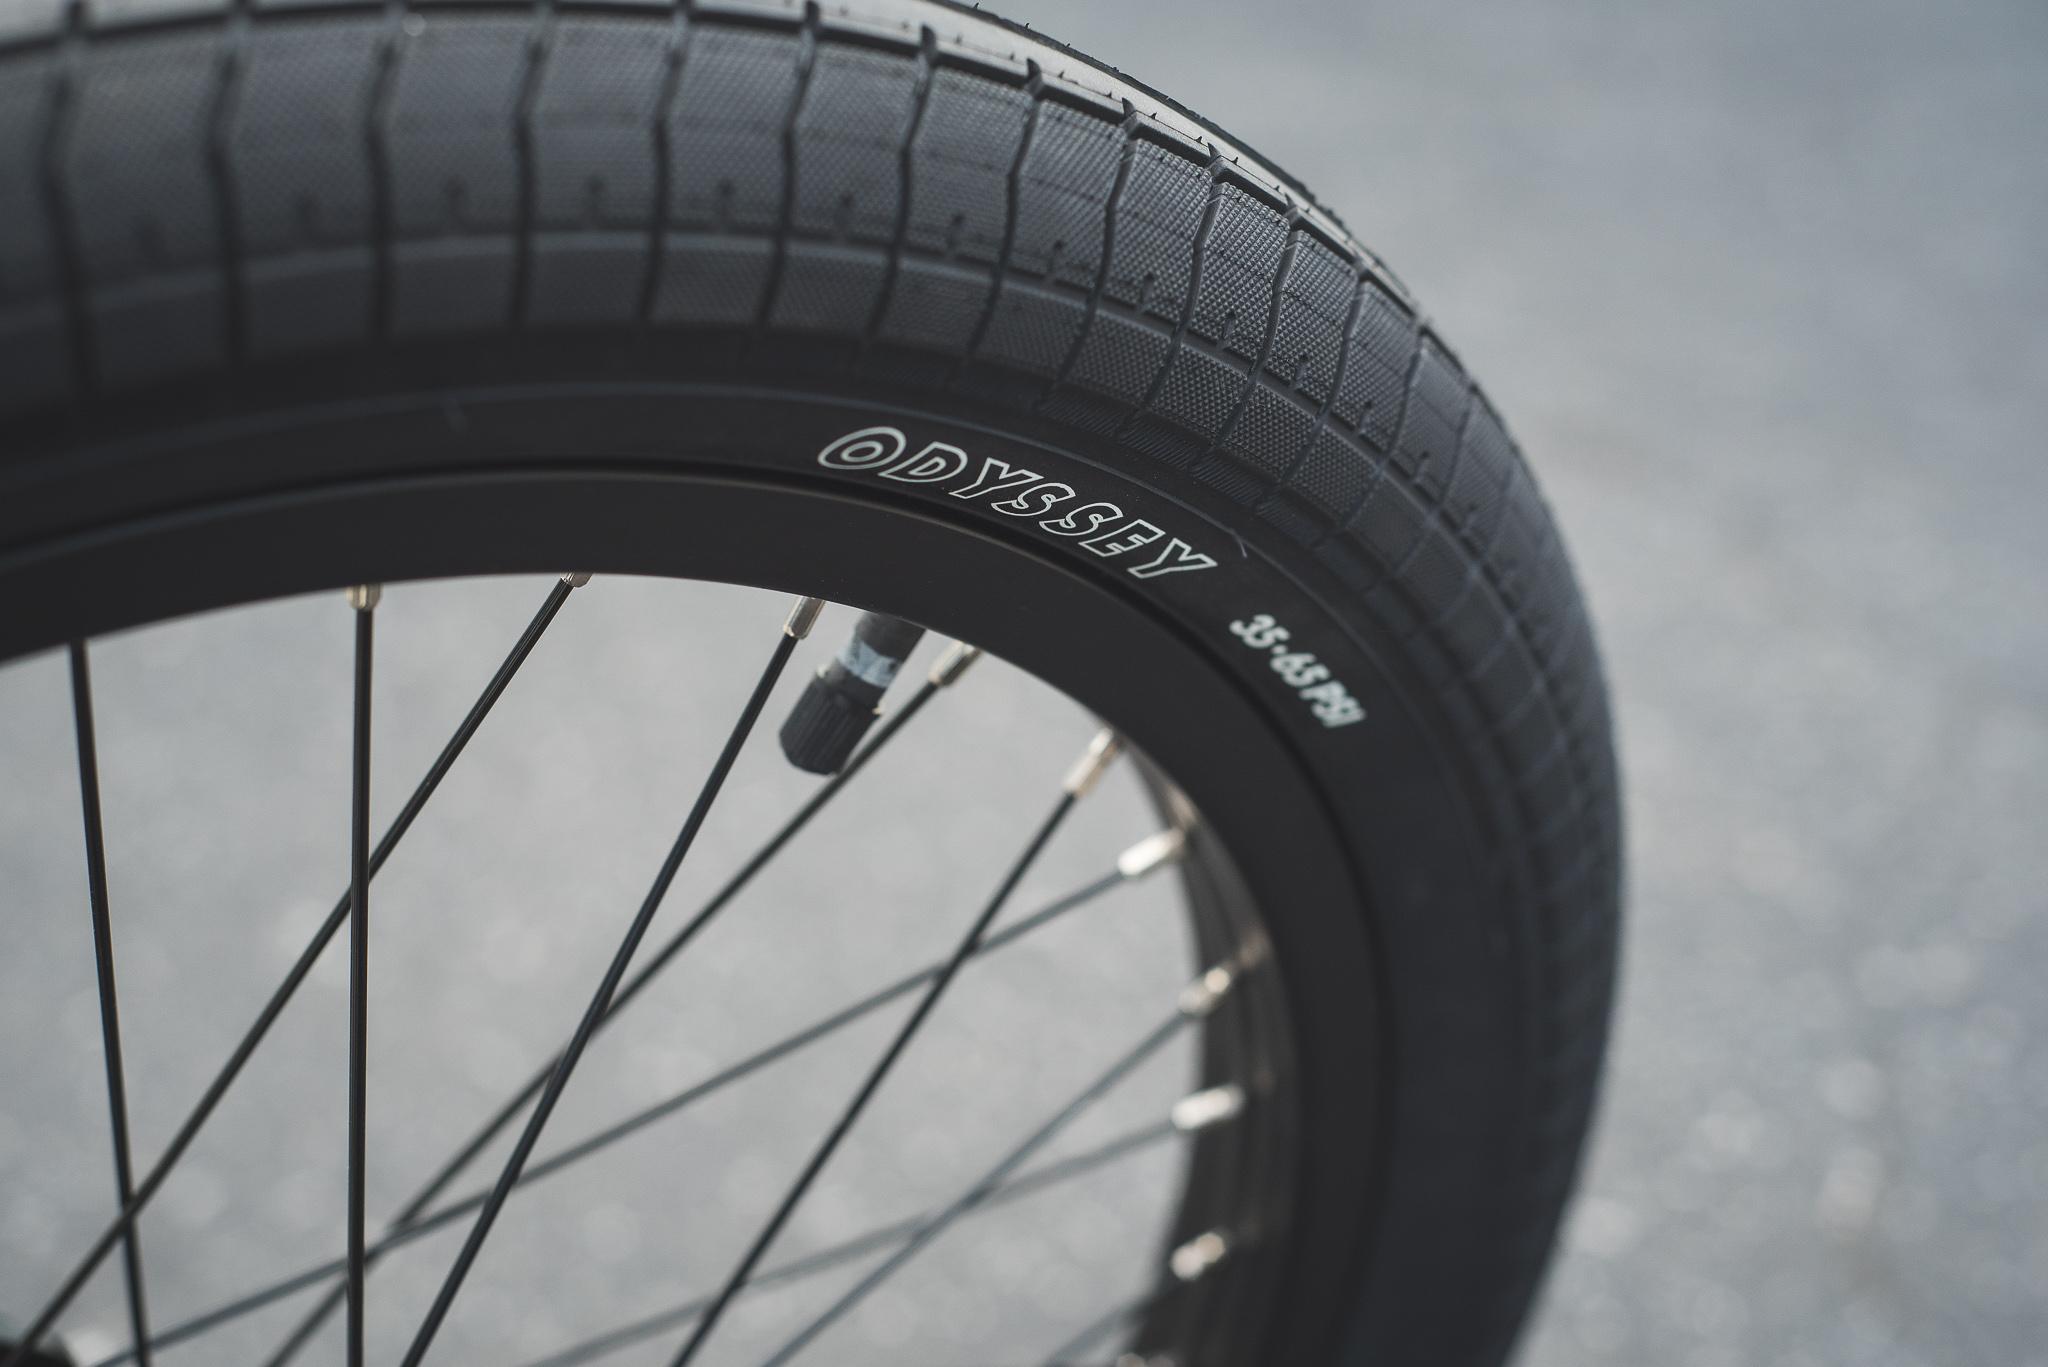 2019 Forecaster / Aaron Ross Signature | Sunday Bikes